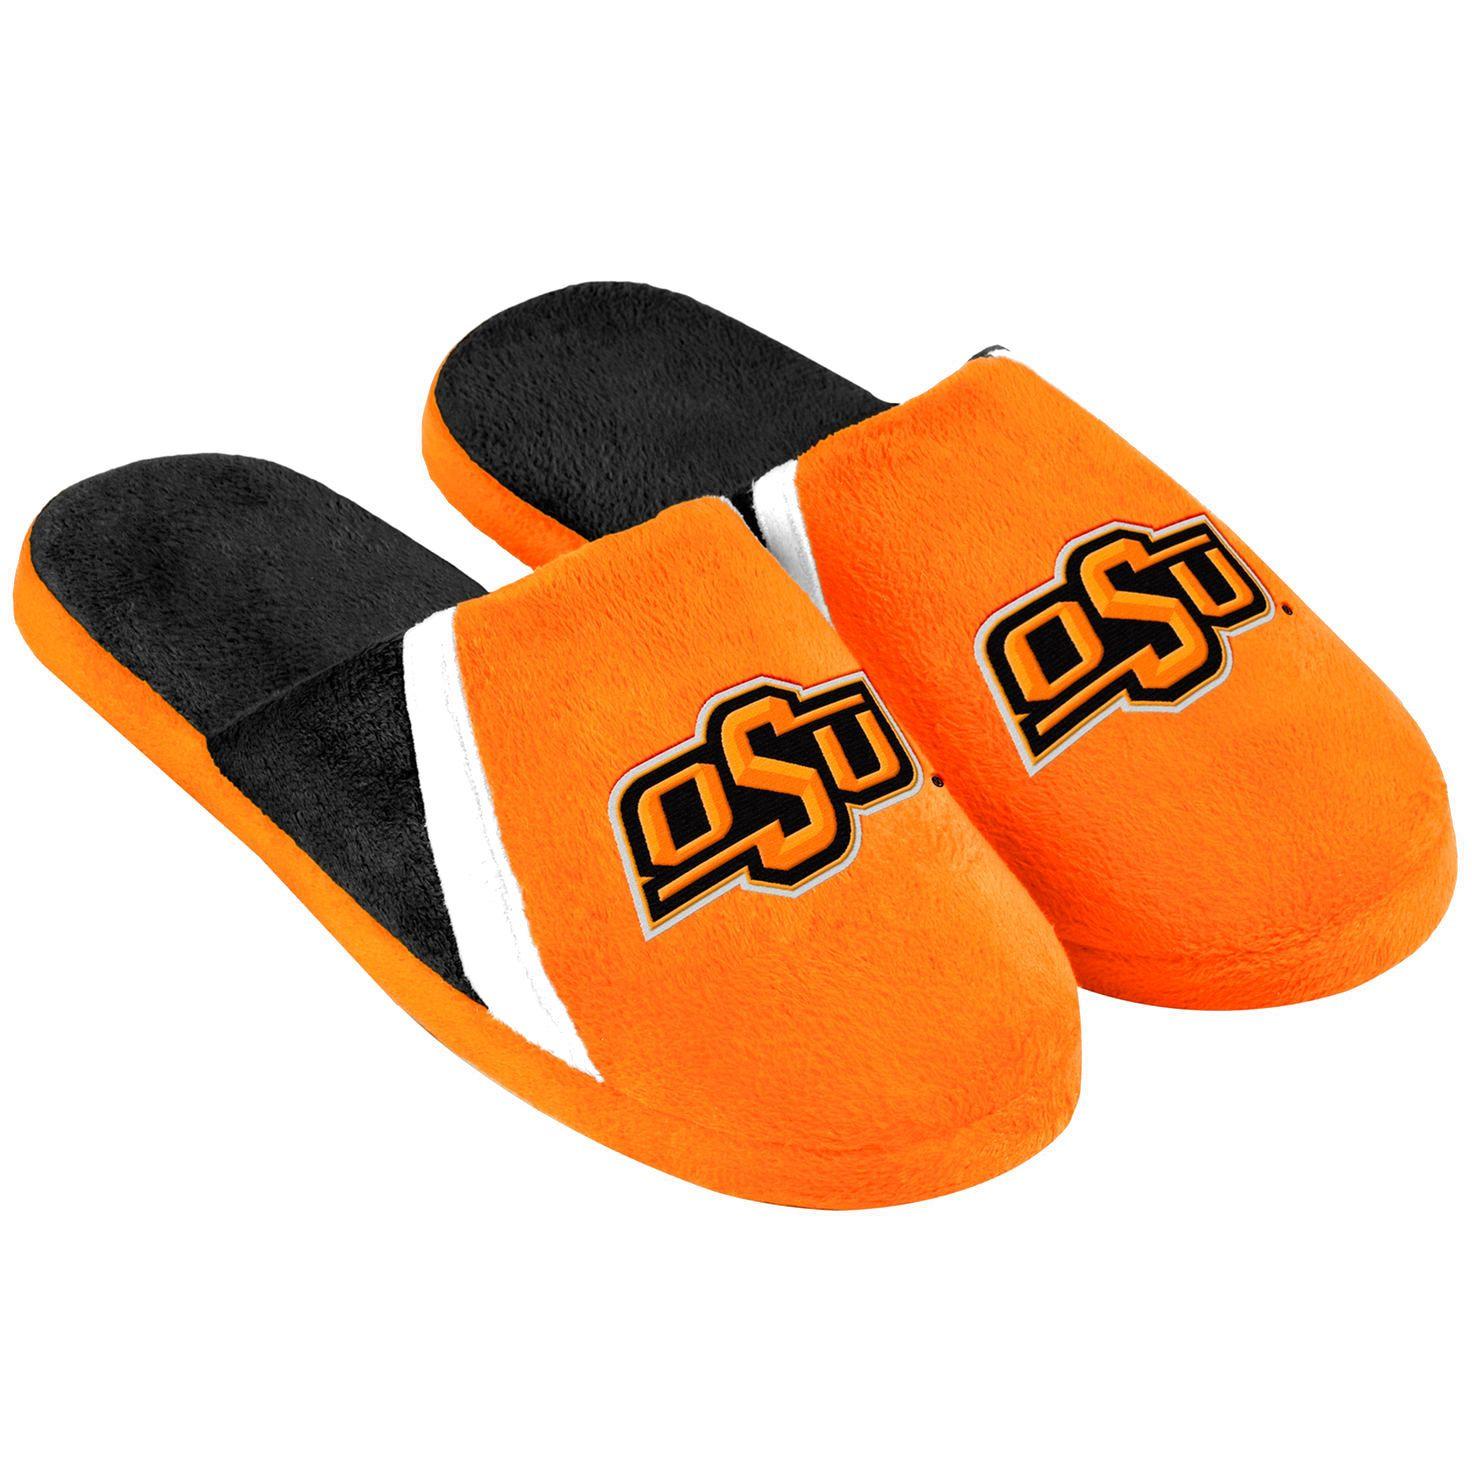 Oklahoma State Cowboys Swoop Logo Slide Slippers - $15.99